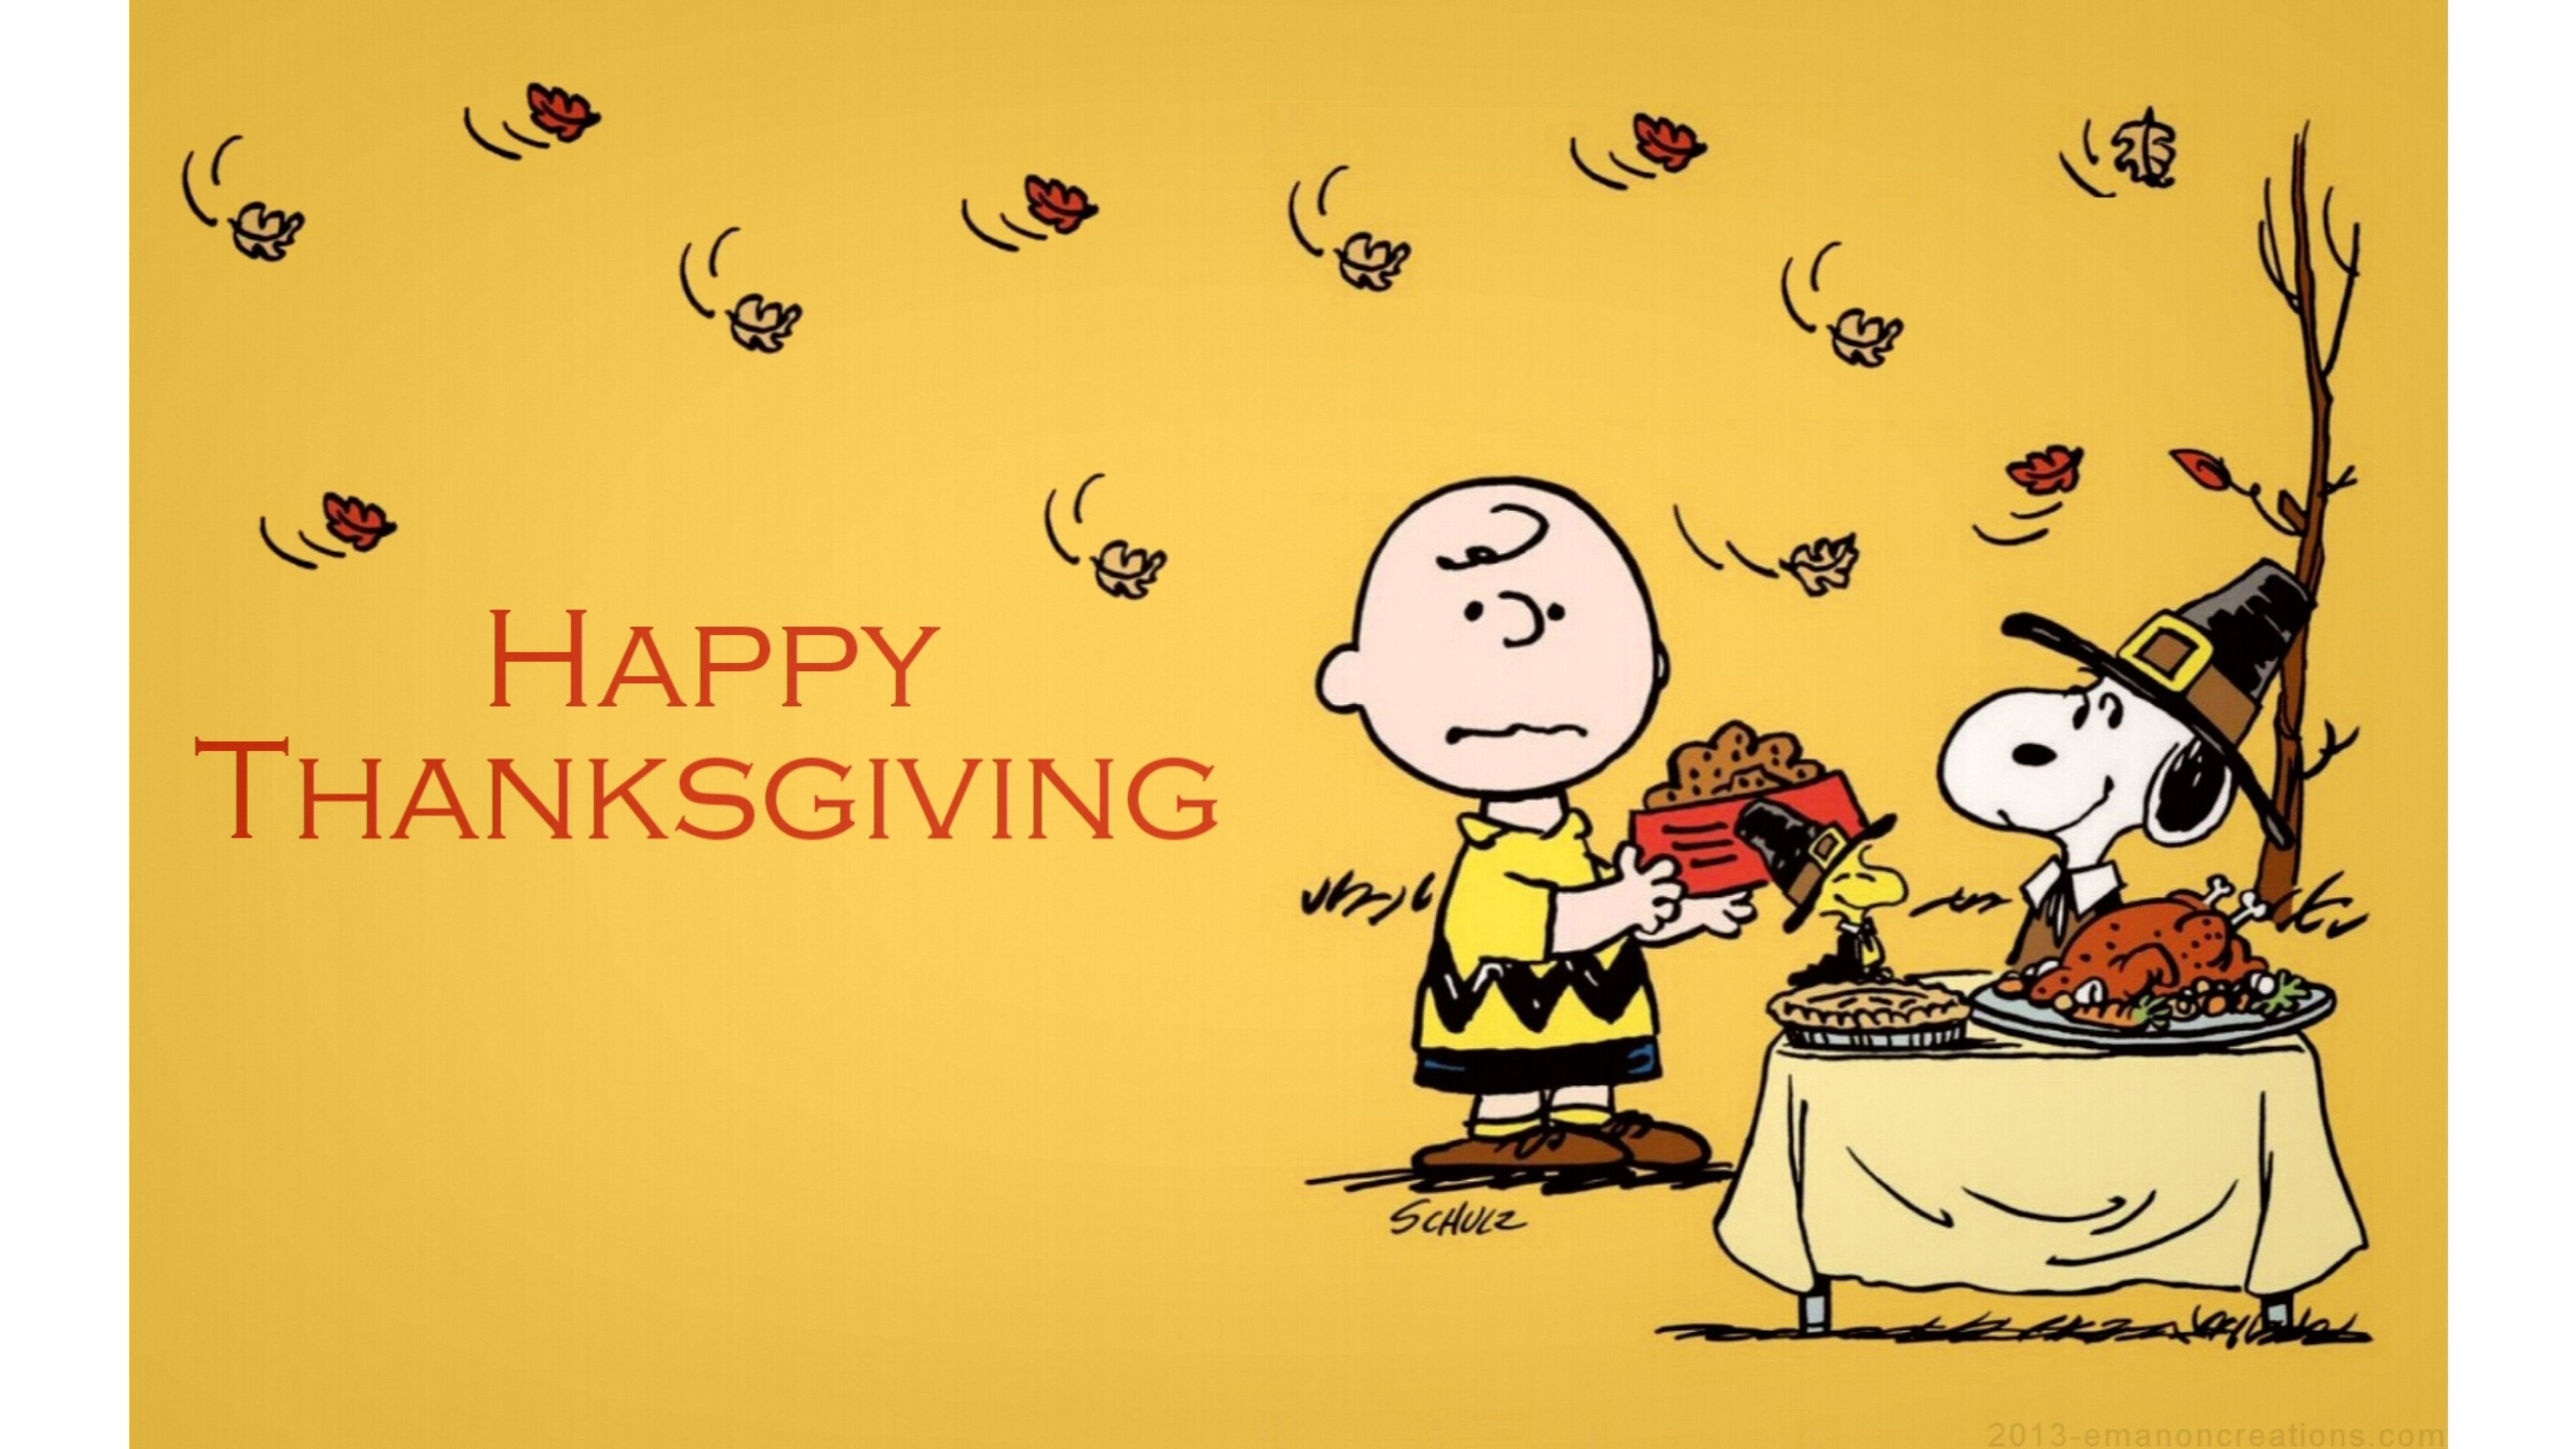 snoopy happy thanksgiving 4k - photo #2